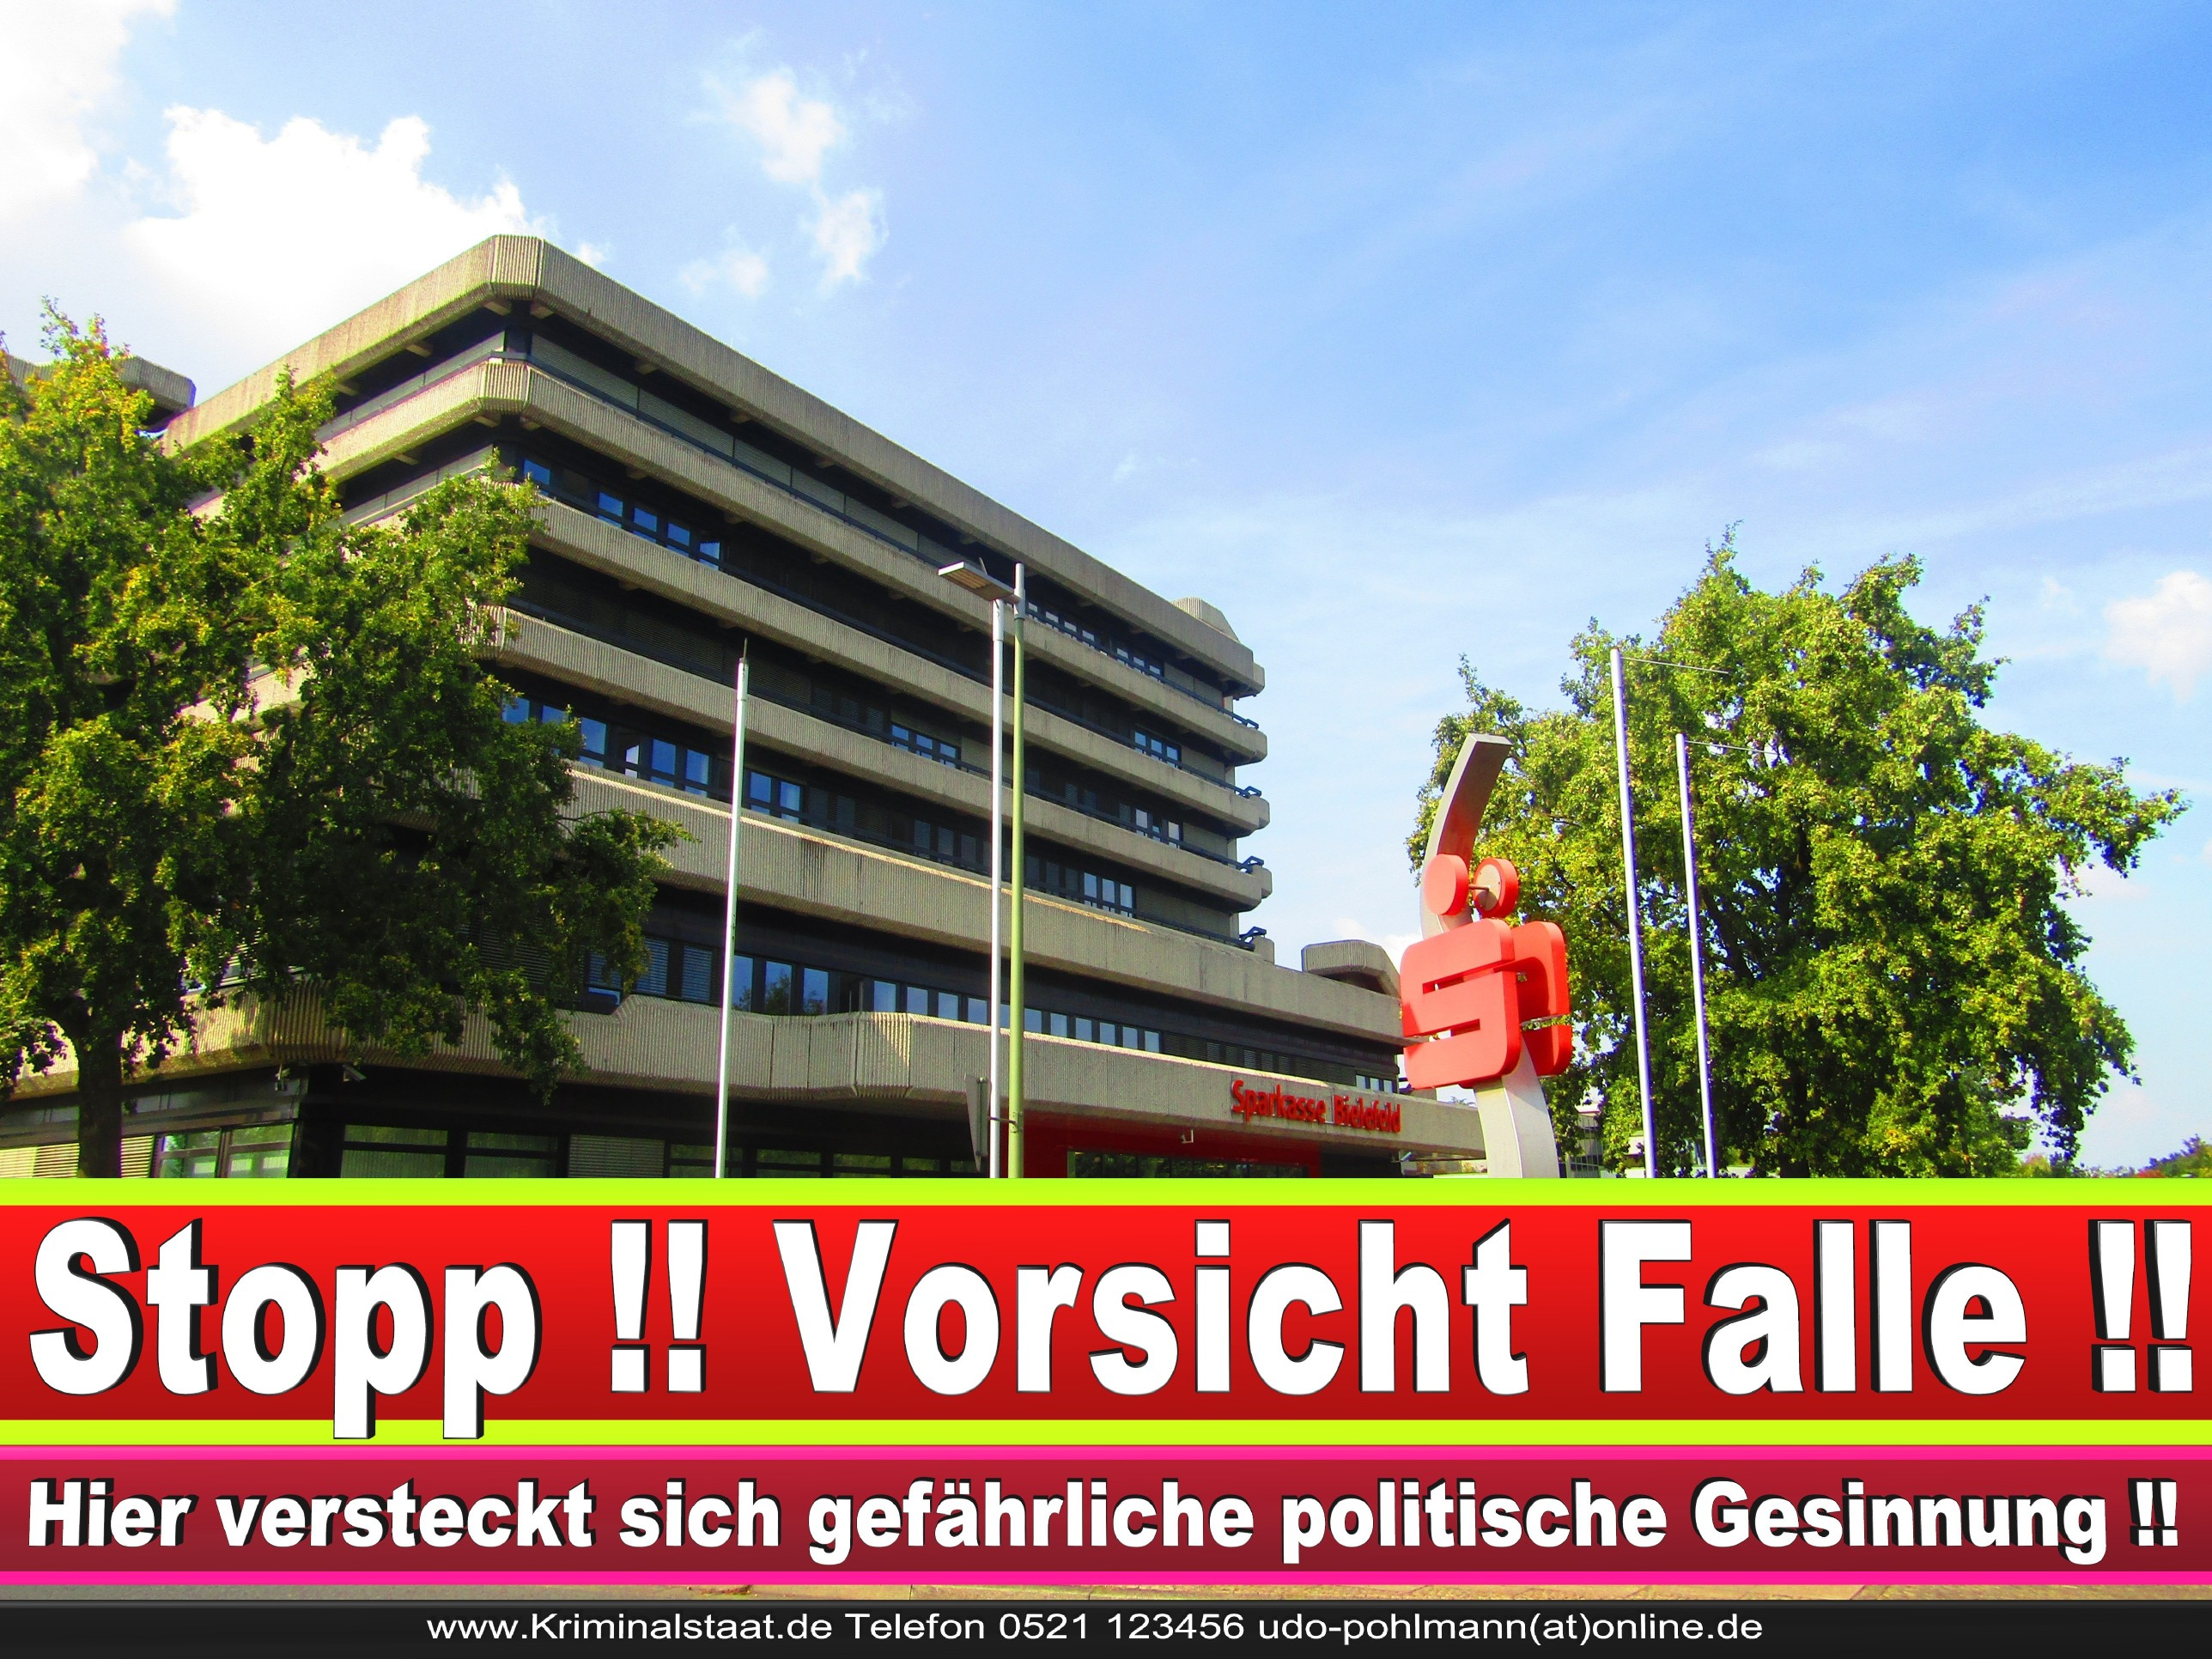 SPARKASSE BIELEFELD ANDREAS RÜTHER CDU BIELEFELD 6 LANDTAGSWAHL BUNDESTAGSWAHL BÜRGERMEISTERWAHL